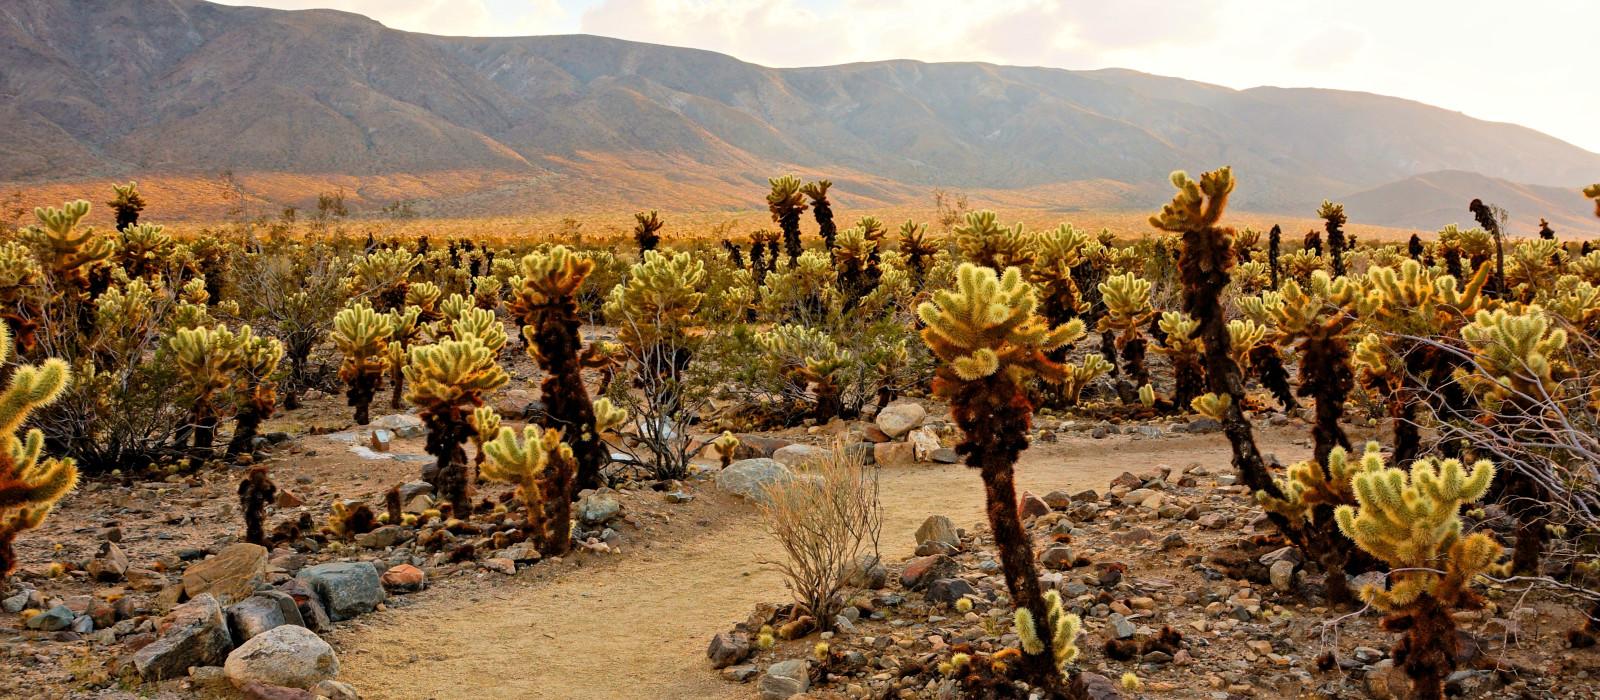 Cholla-Kaktusgarten bei Sonnenuntergang im Joshua-Tree-Nationalpark, Kalifornien, USA